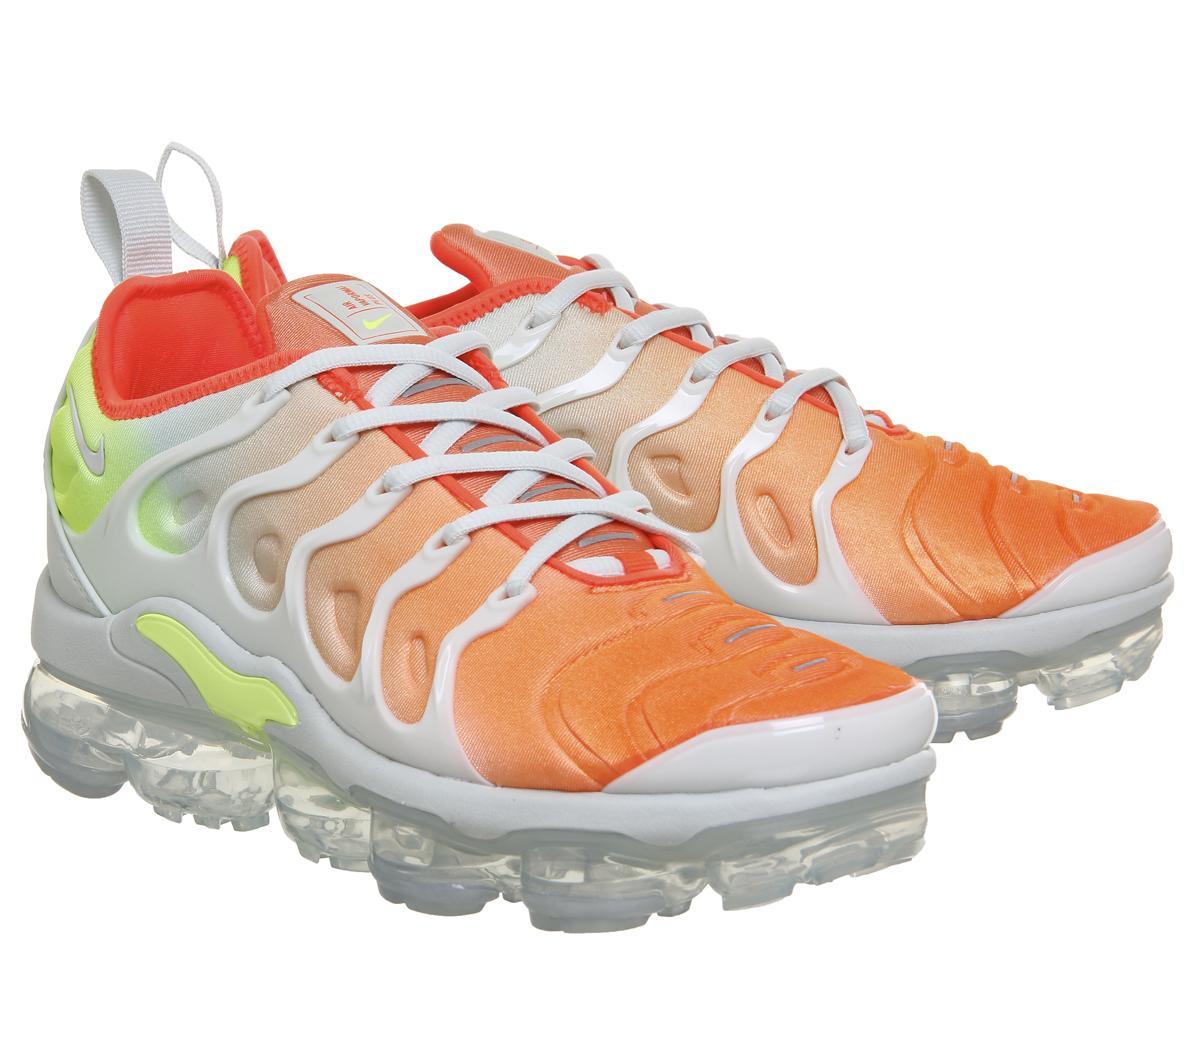 aec784a44c0 Nike - Gray Air Vapormax Plus Trainers - Lyst. View fullscreen